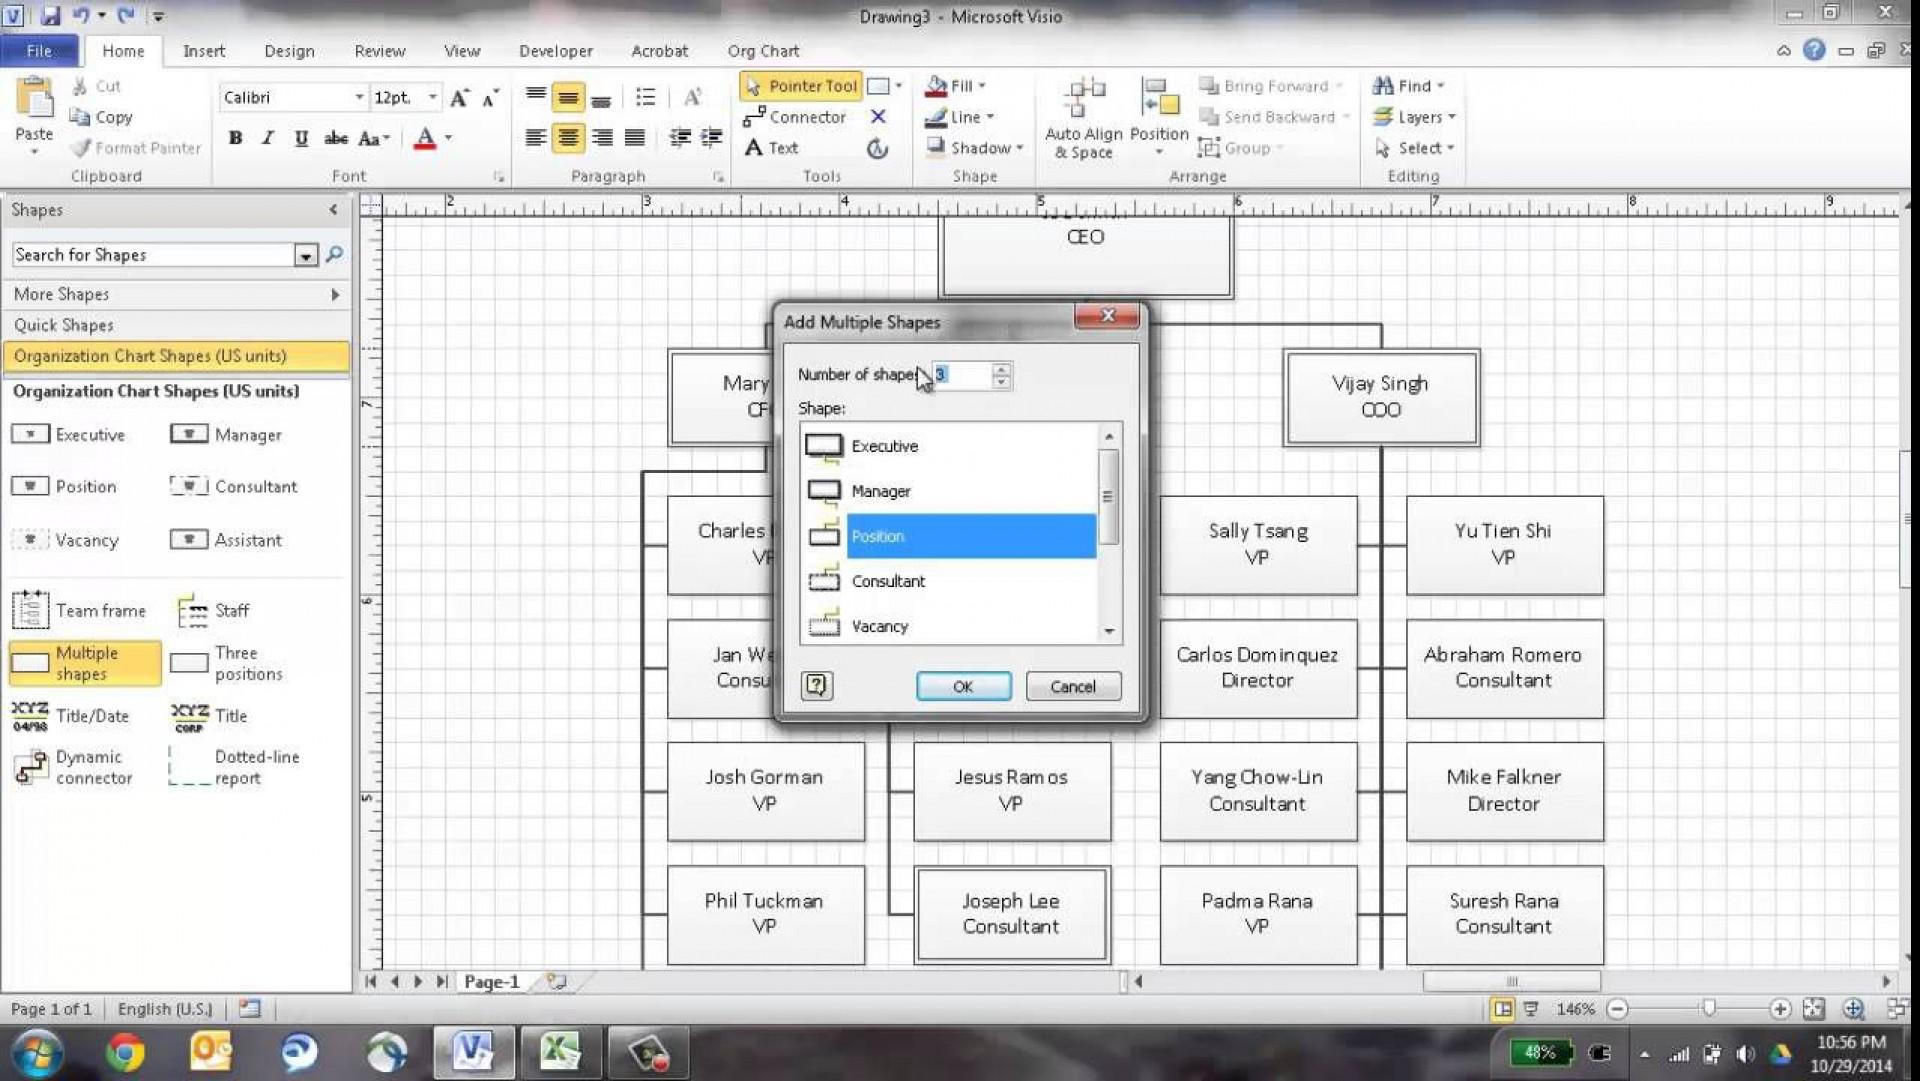 004 Astounding Microsoft Visio Organization Chart Template Design  Org1920